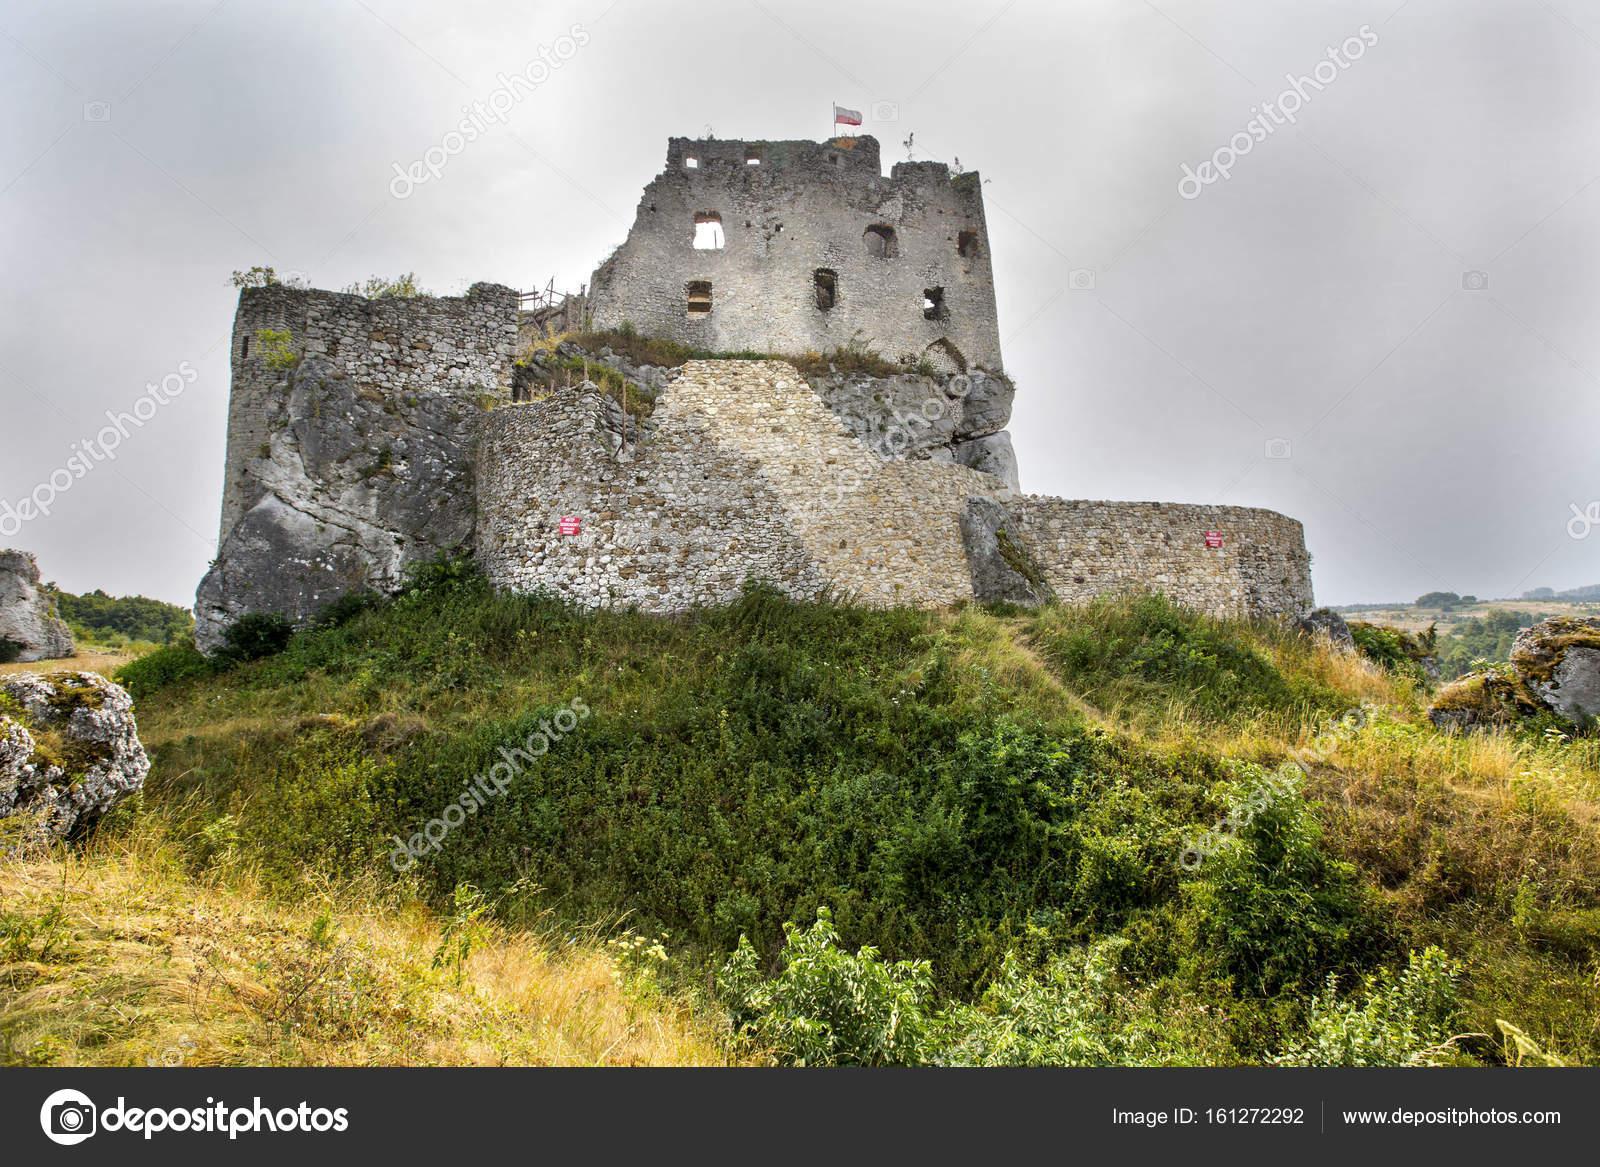 Pittoresche Rovine Del Castello A Mirow Su Jura Krakowsko Czestochowa Foto Di Warant